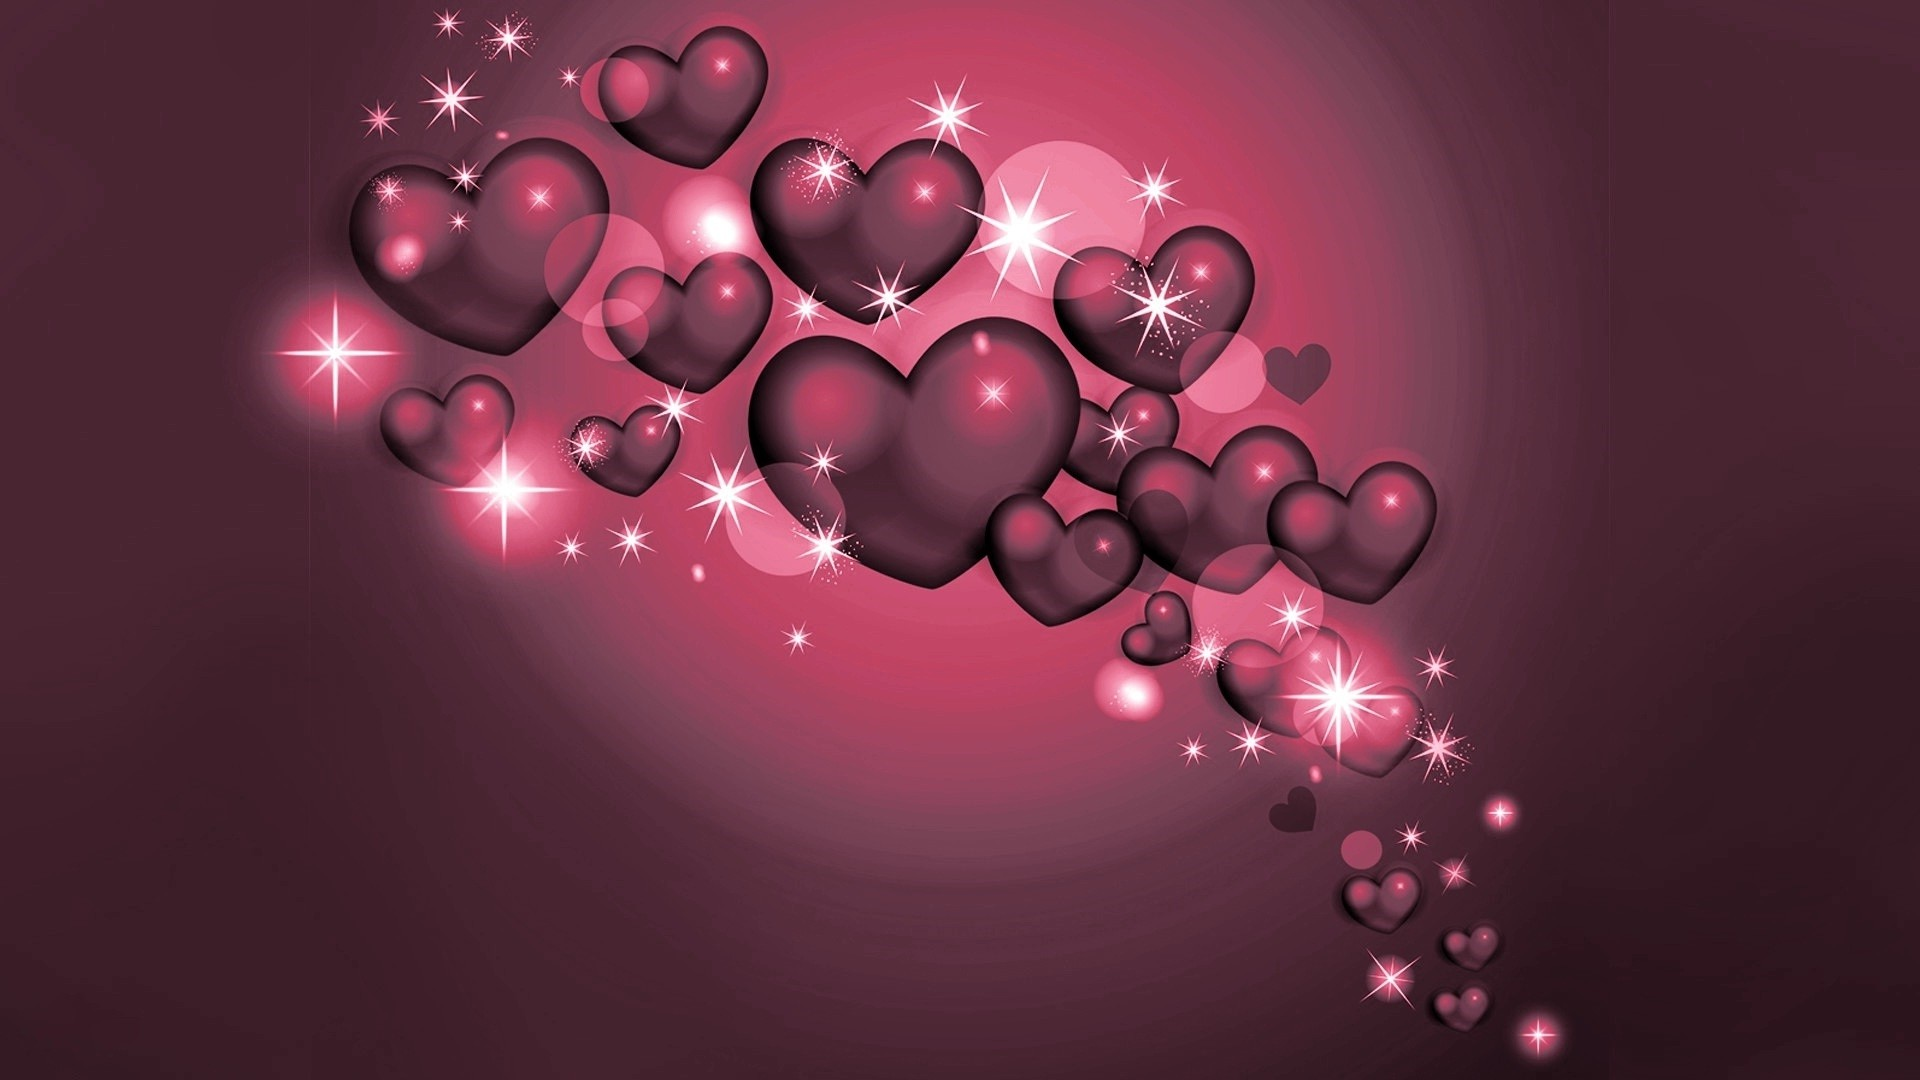 LOVE SPECIAL GLITTERING CUTE LOVE HEARTS DESKTOP BACKGROUND .